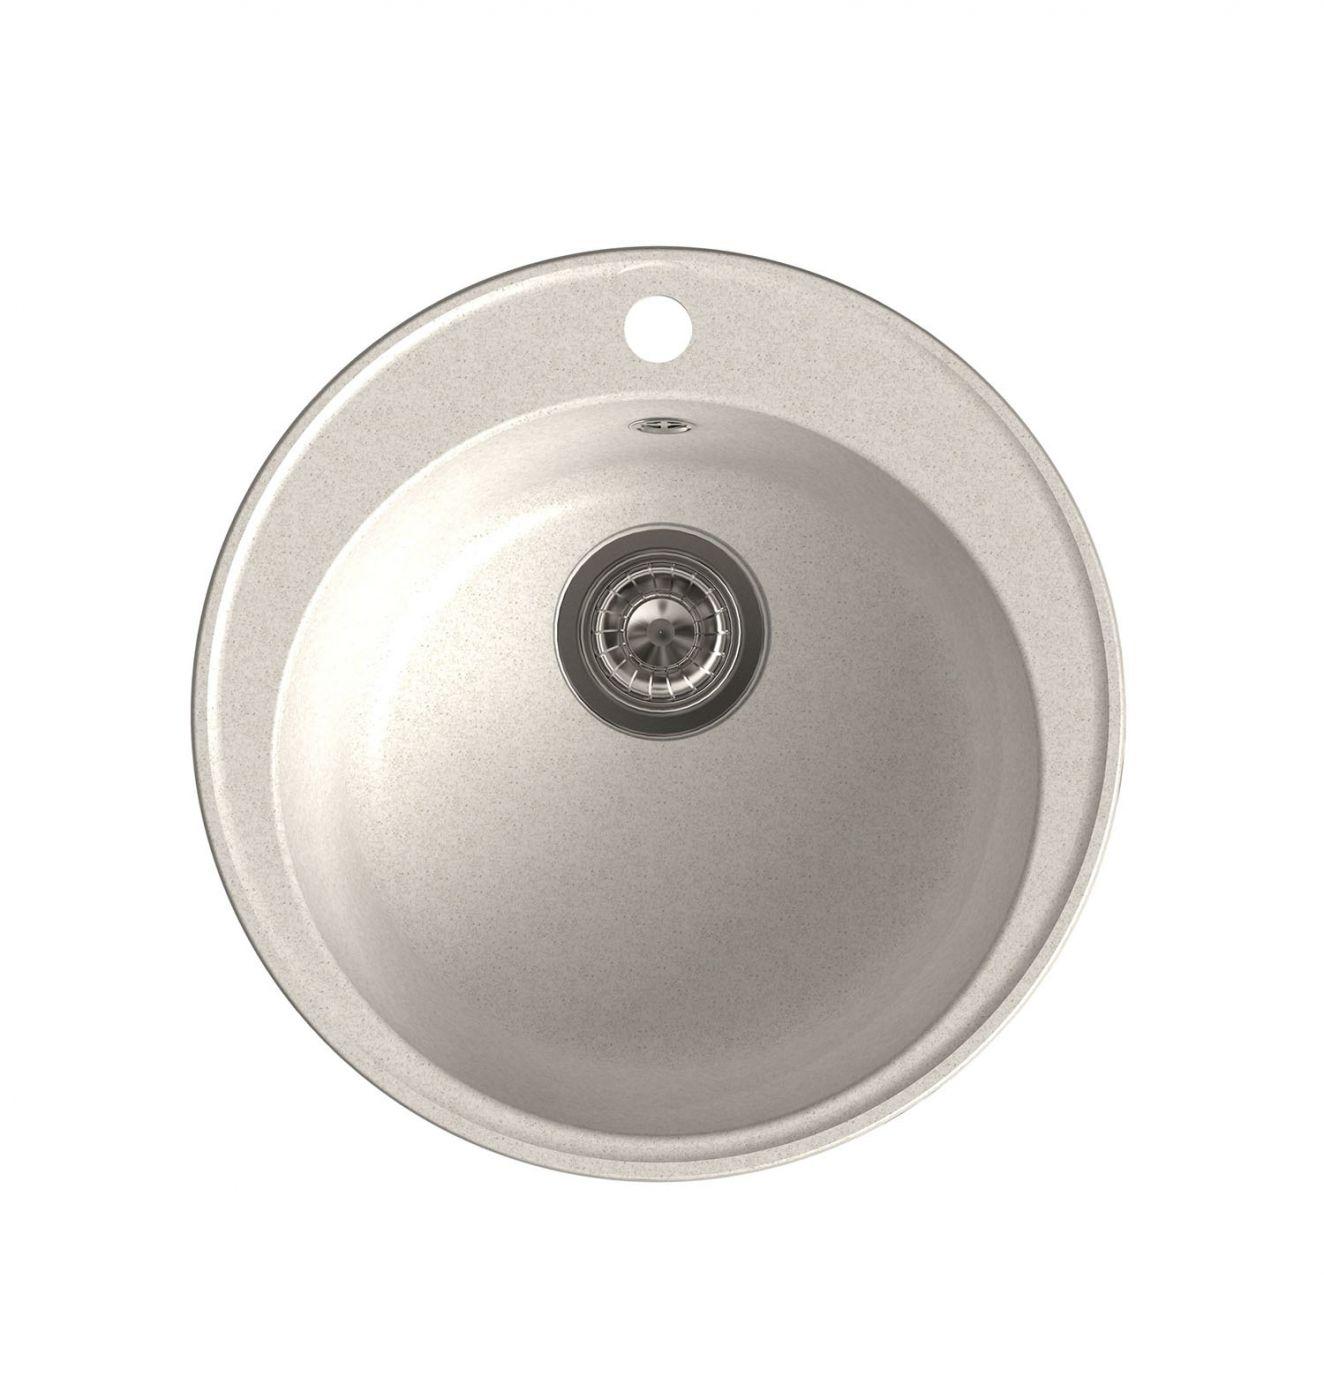 Врезная кухонная мойка LEX Lugano 480 White  48х48см полимер RULE000001